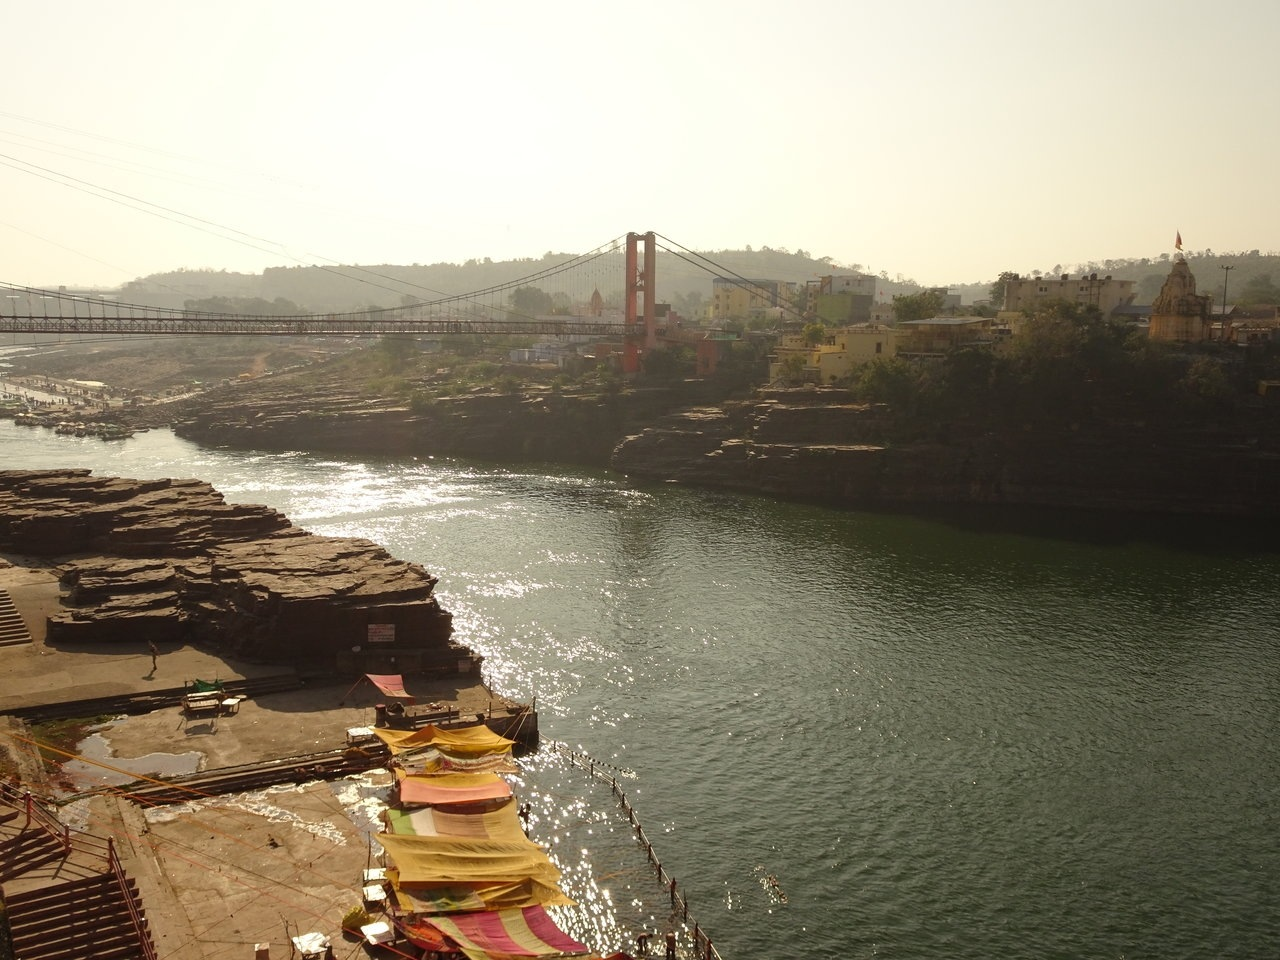 Bridge connecting Omkareshwar island with mainland